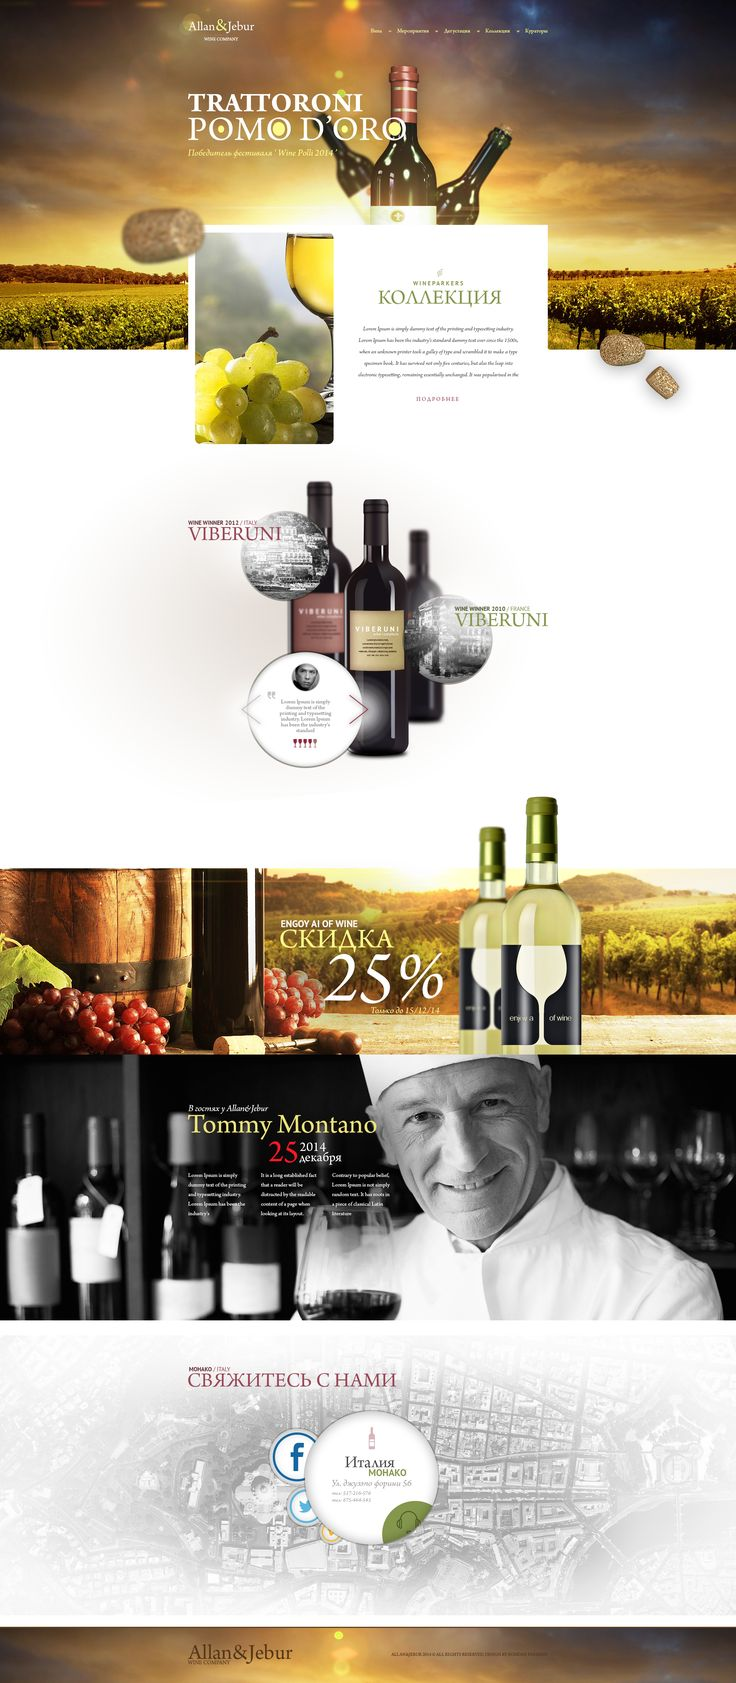 Web Design - Allan and Jebur Wine Company by Shizoy.deviantart.com on @DeviantArt